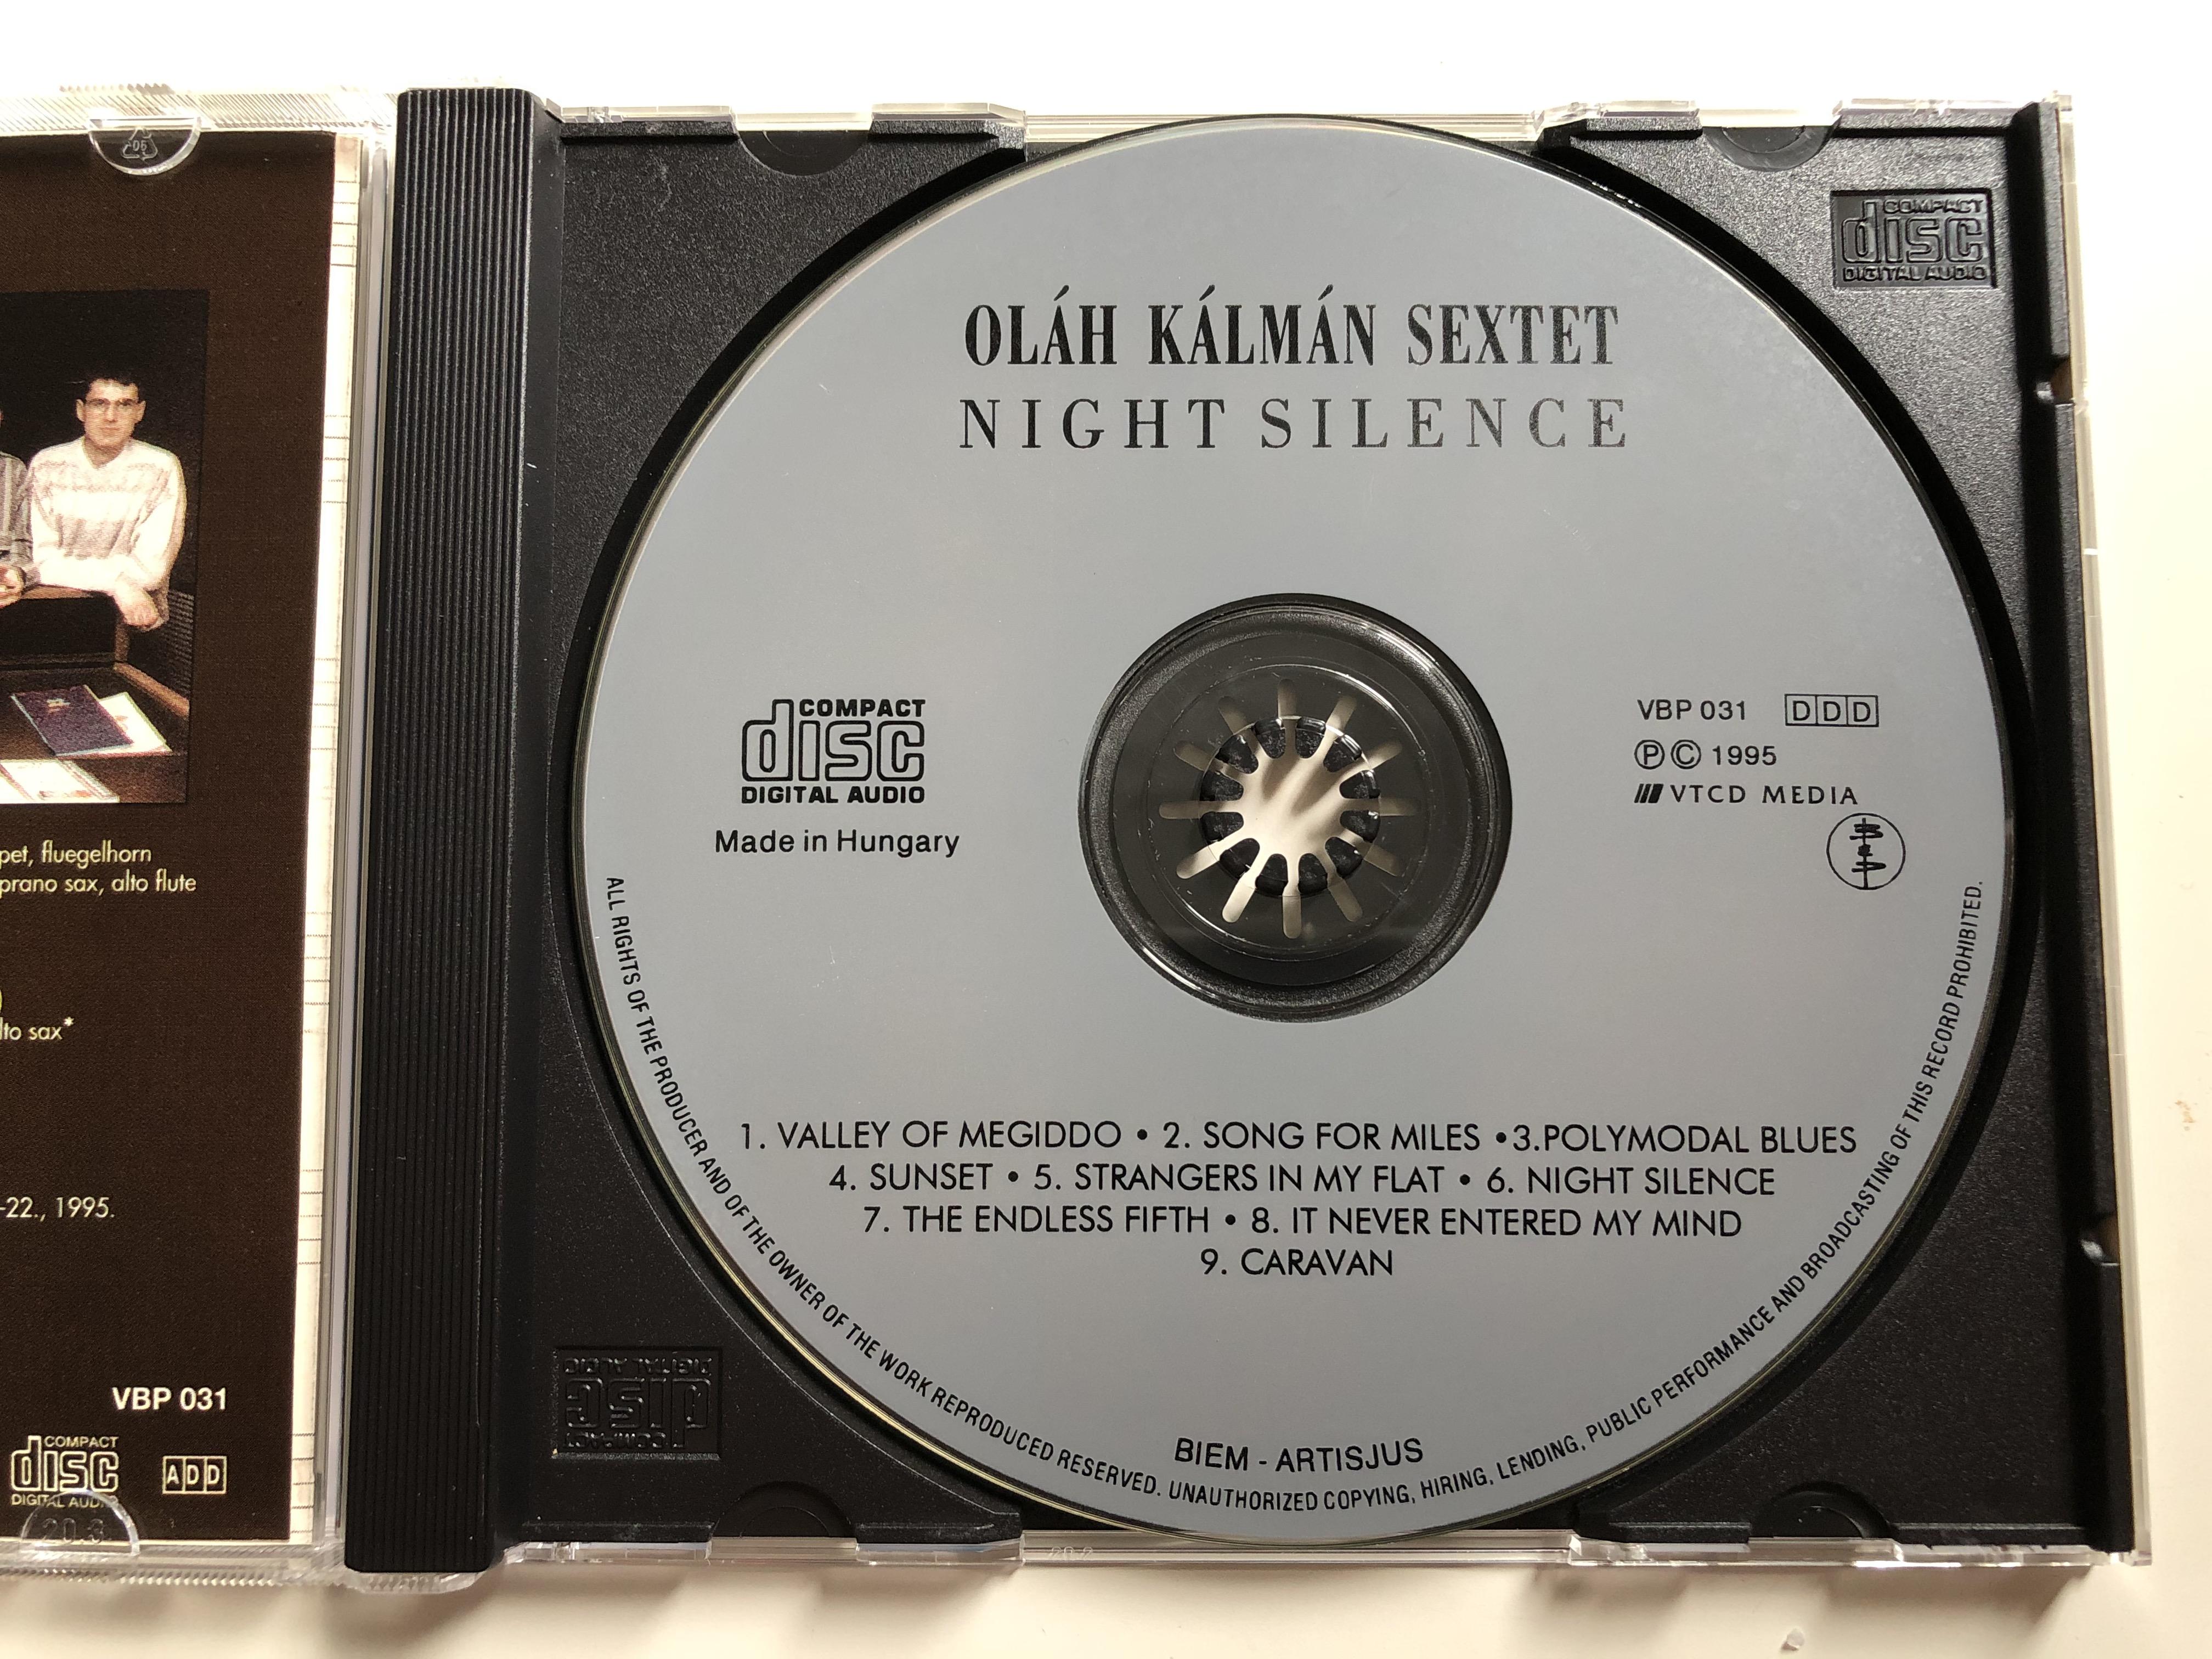 ol-h-k-lm-n-sextet-night-silence-featuring-dezso-ablakos-lakatos-feket-kovacs-kornel-makovics-denes-schreck-ferenc-balazs-elemer-egri-janos-bouvard-p-cuchet-records-audio-cd-199-5-.jpg